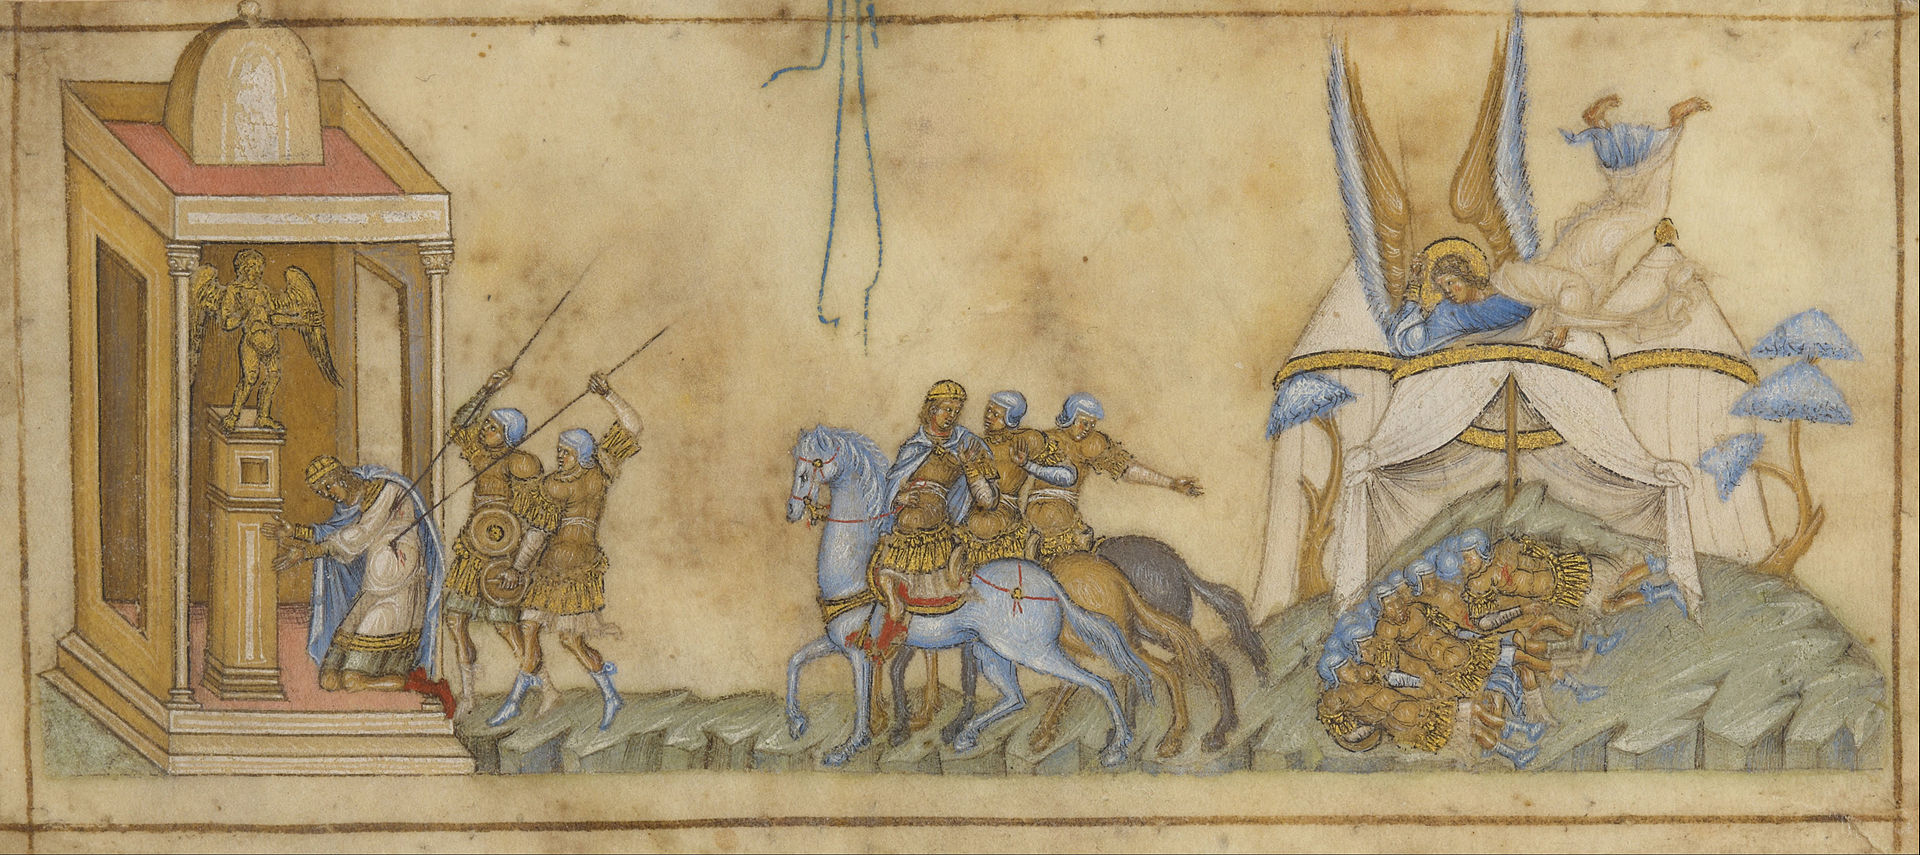 The_Death_of_Sennacherib_-_Google_Art_Project.jpg